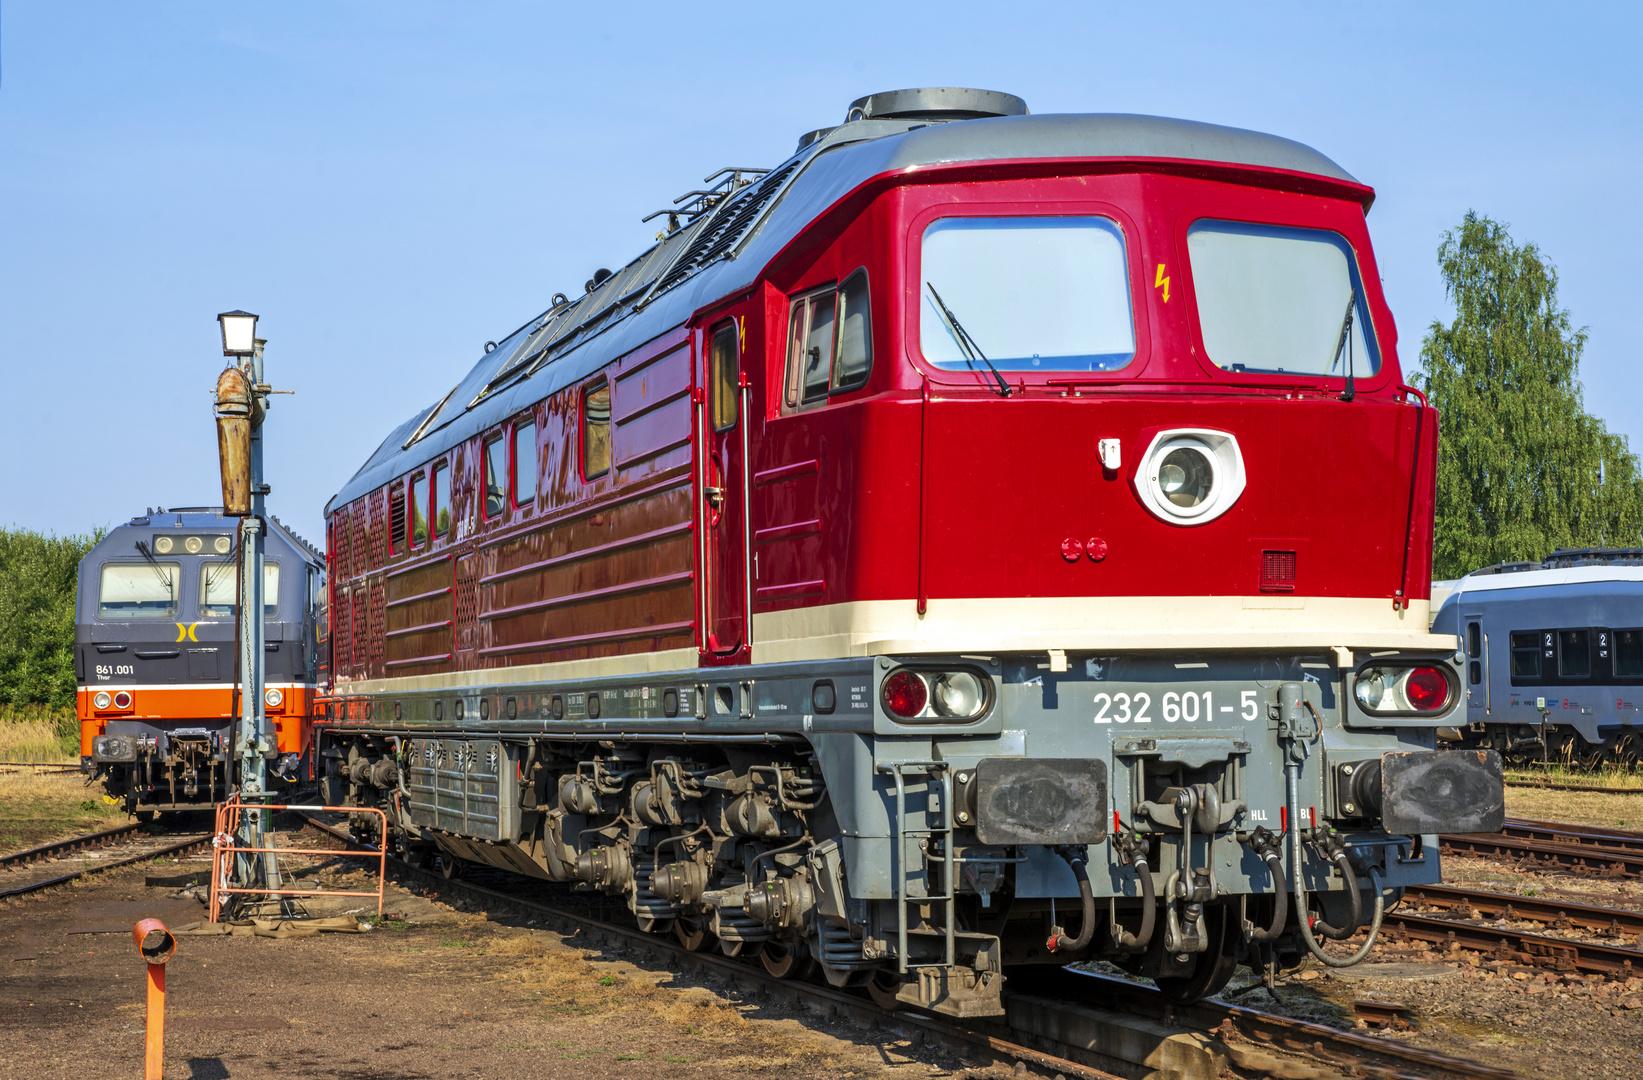 BR 232 601-5 Hilbersdorf 2018